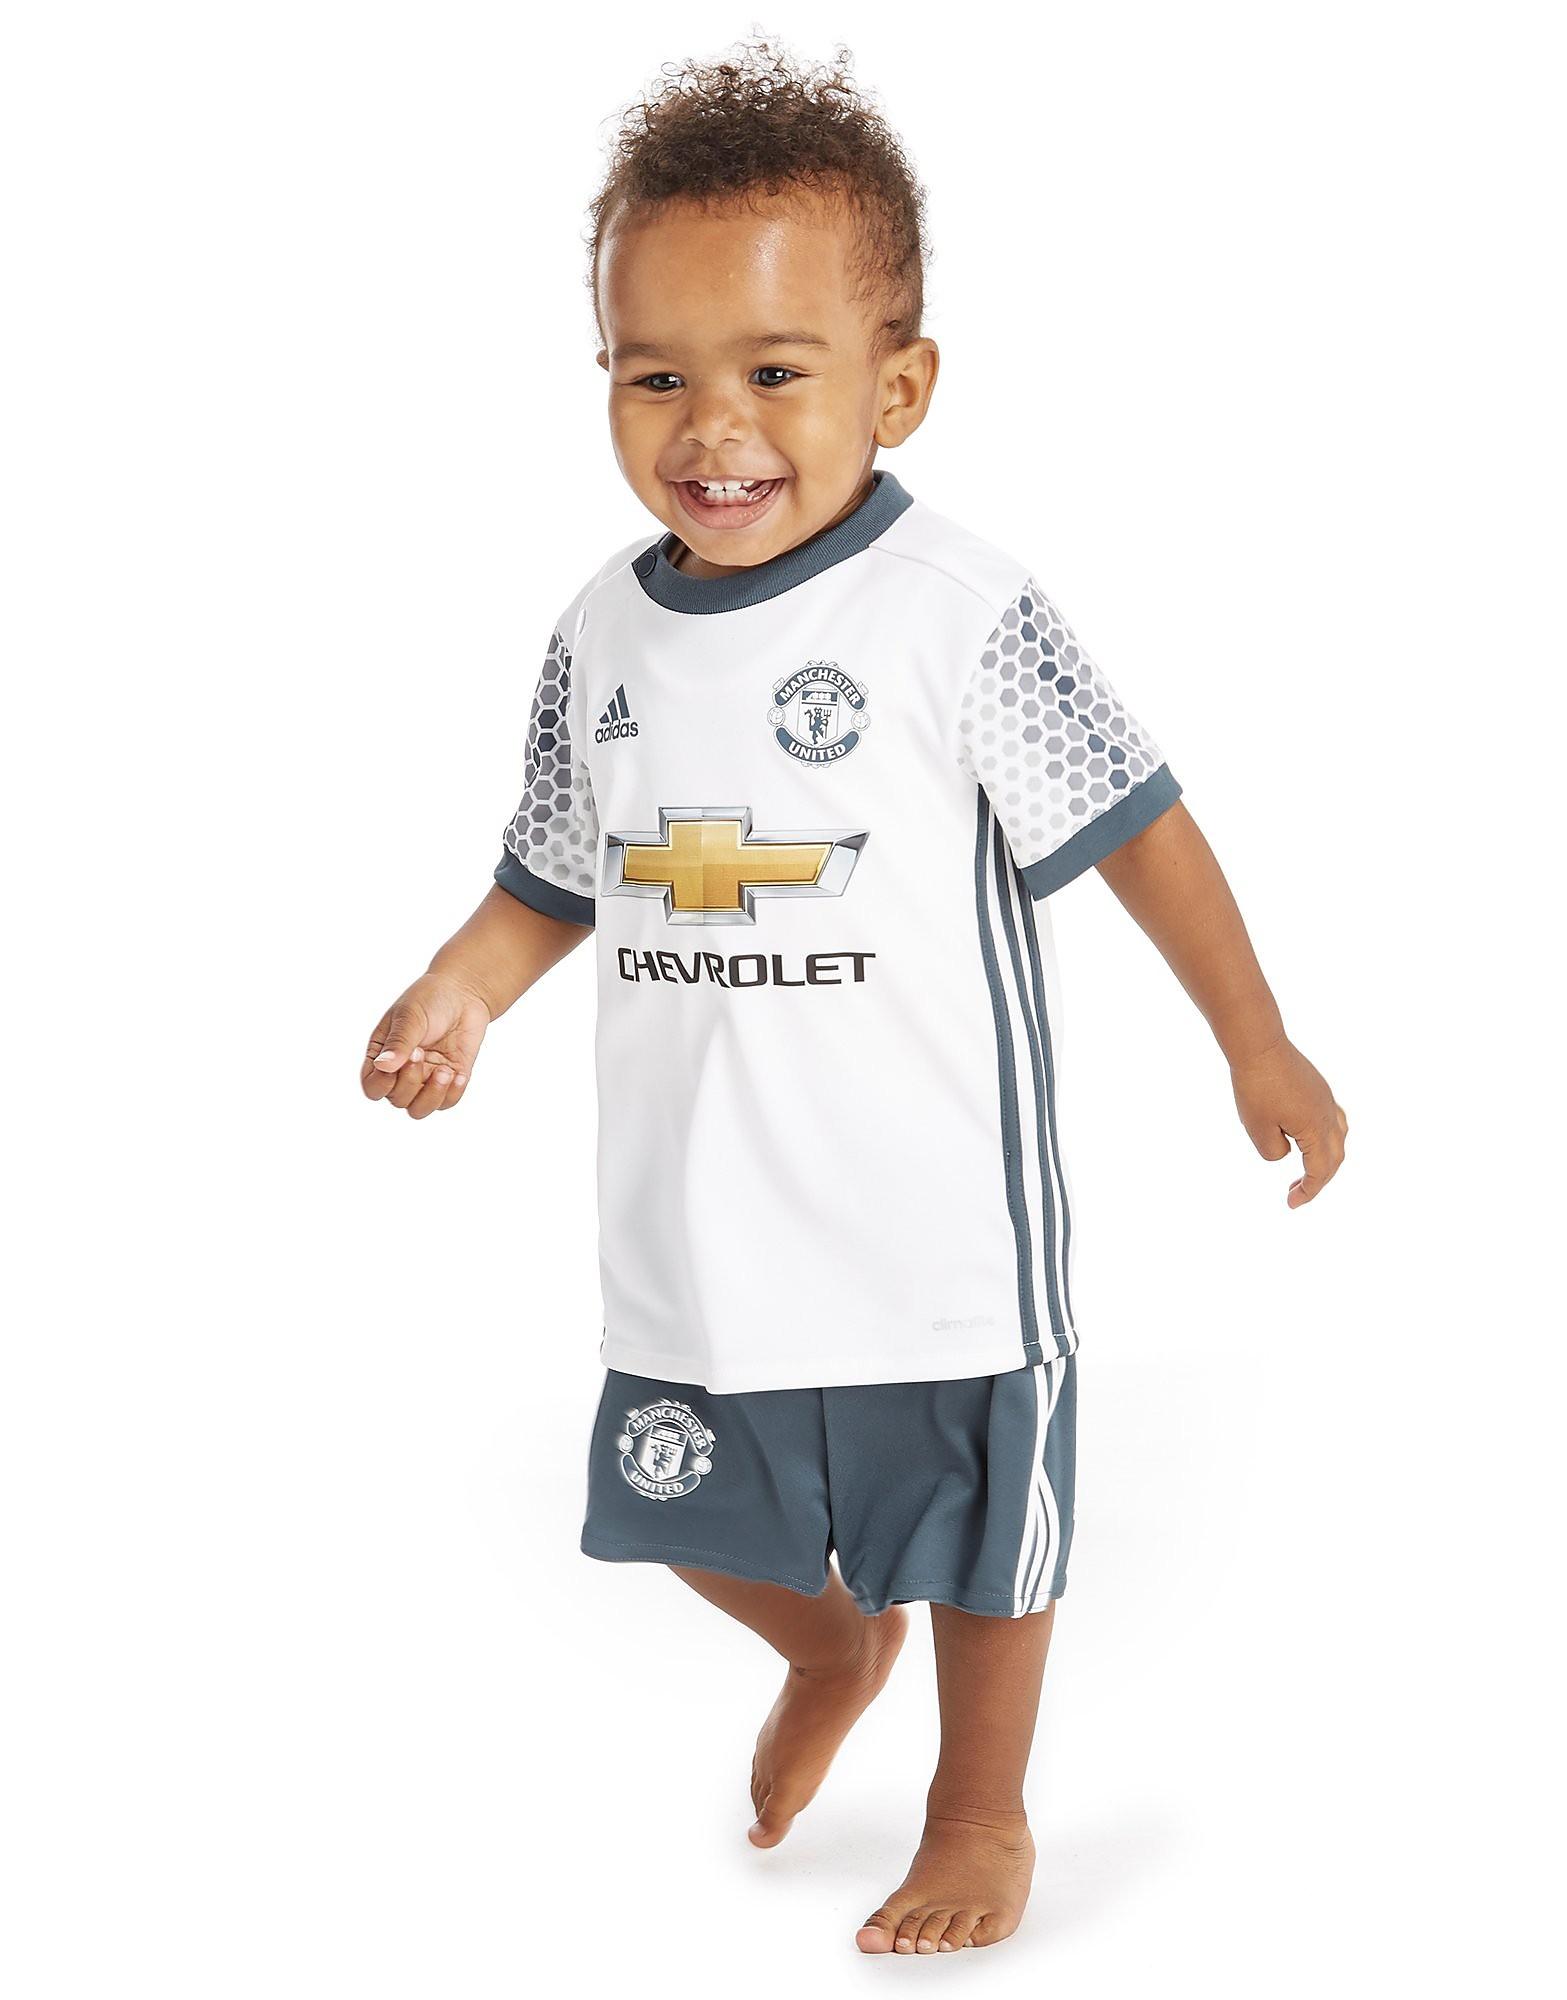 adidas Manchester United 2016/17 tredjesæt baby